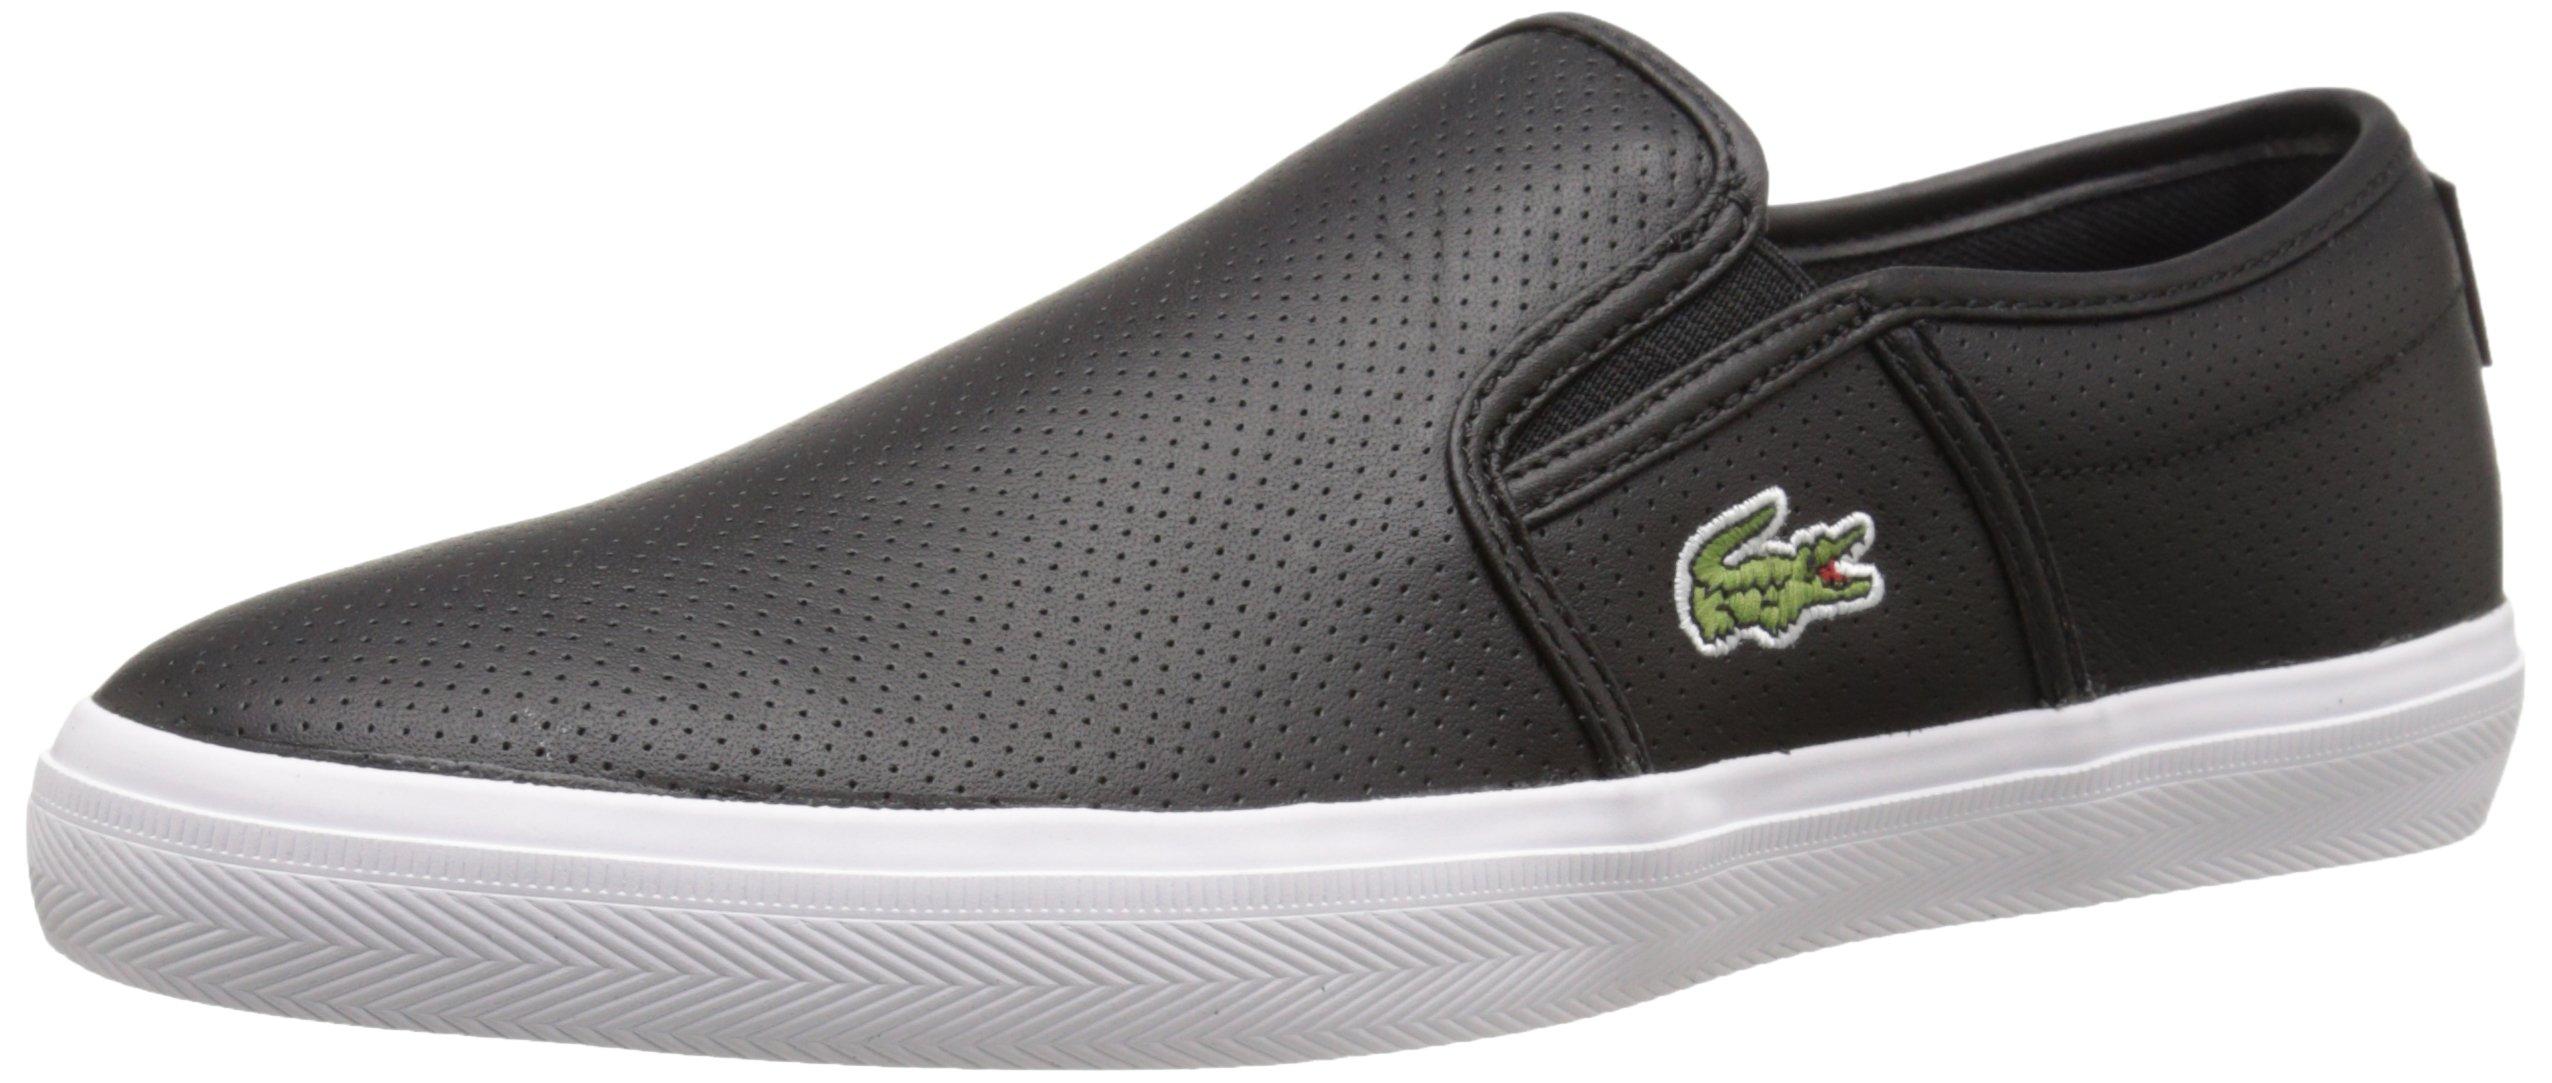 74d6d598e58369 Galleon - Lacoste Men s Gazon Sport TCL Fashion Sneaker